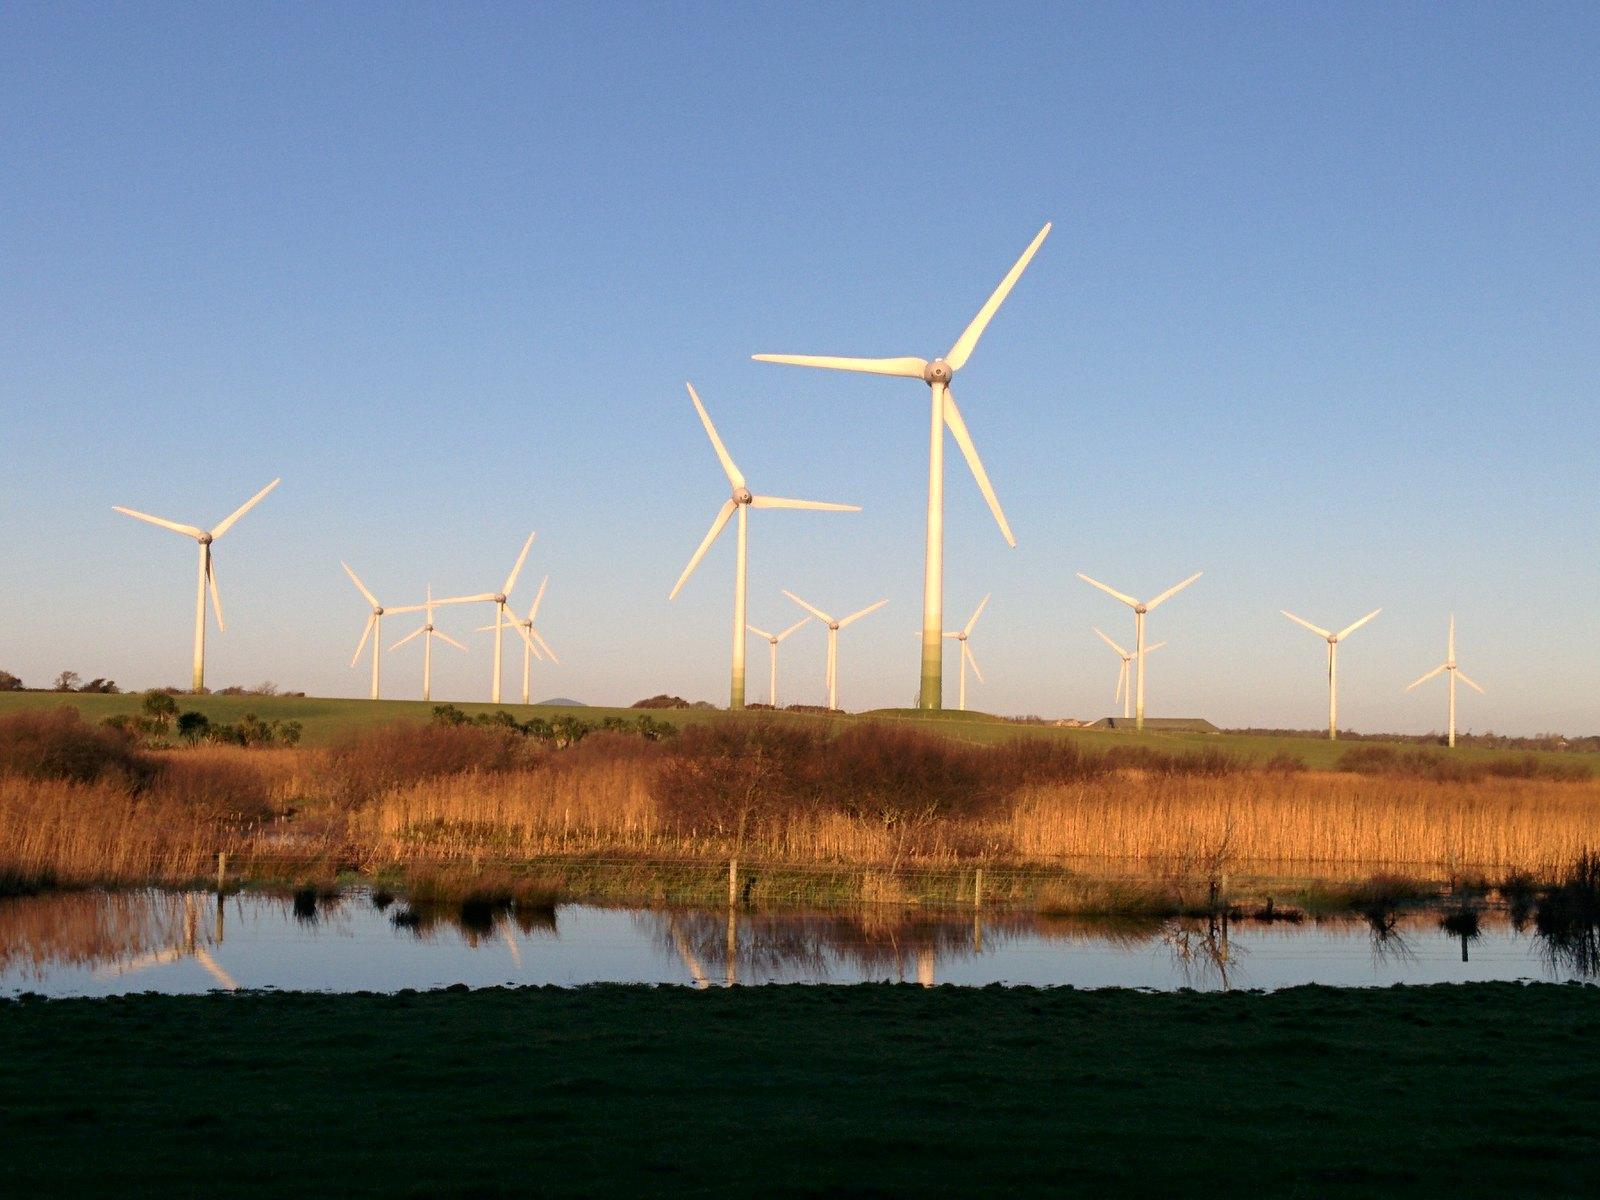 Wind turbines in County Wexford Ireland.